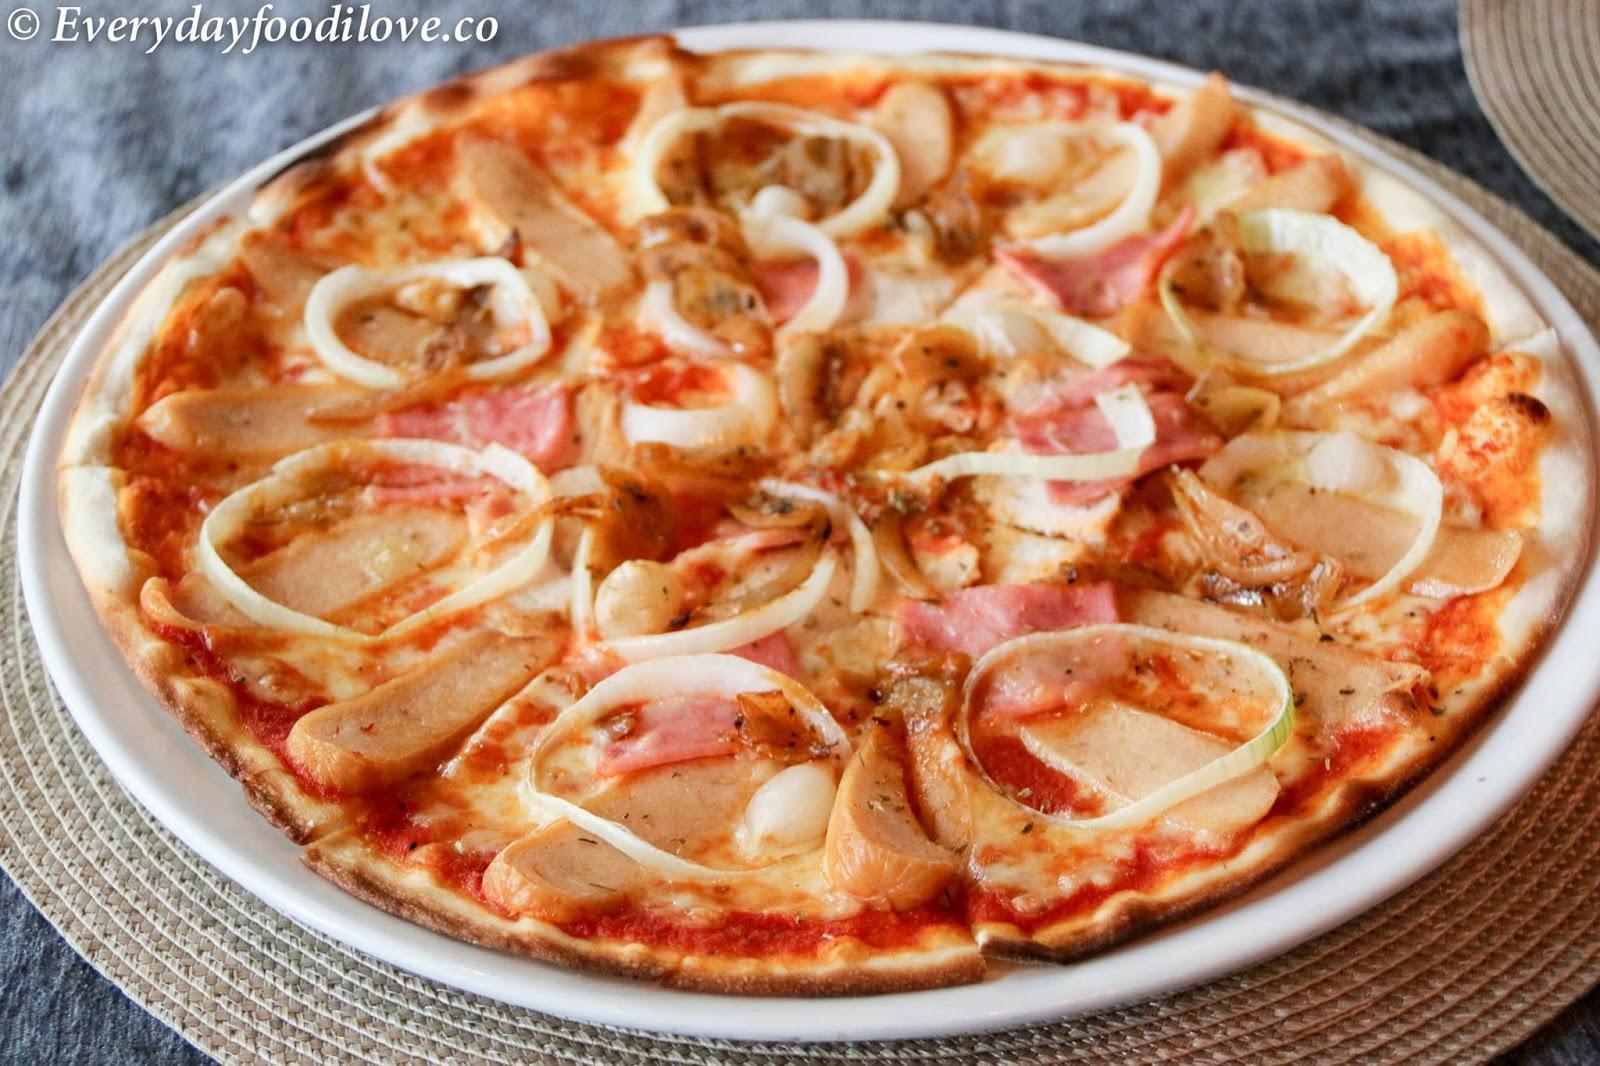 ... onion, onion marmalade, mozzarella, cheddar and emmental cheeses